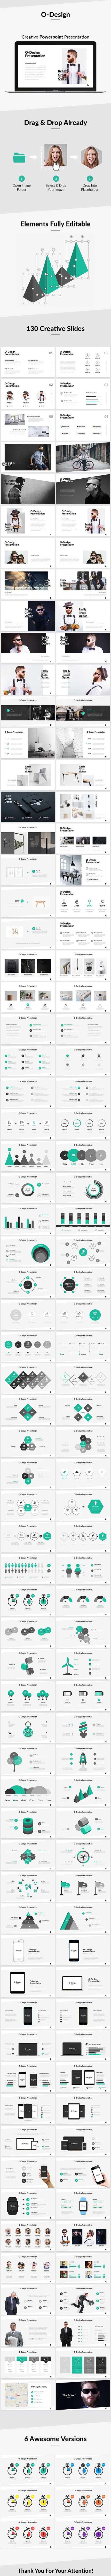 O-Design Creative Powerpoint Presentation - Creative PowerPoint Templates